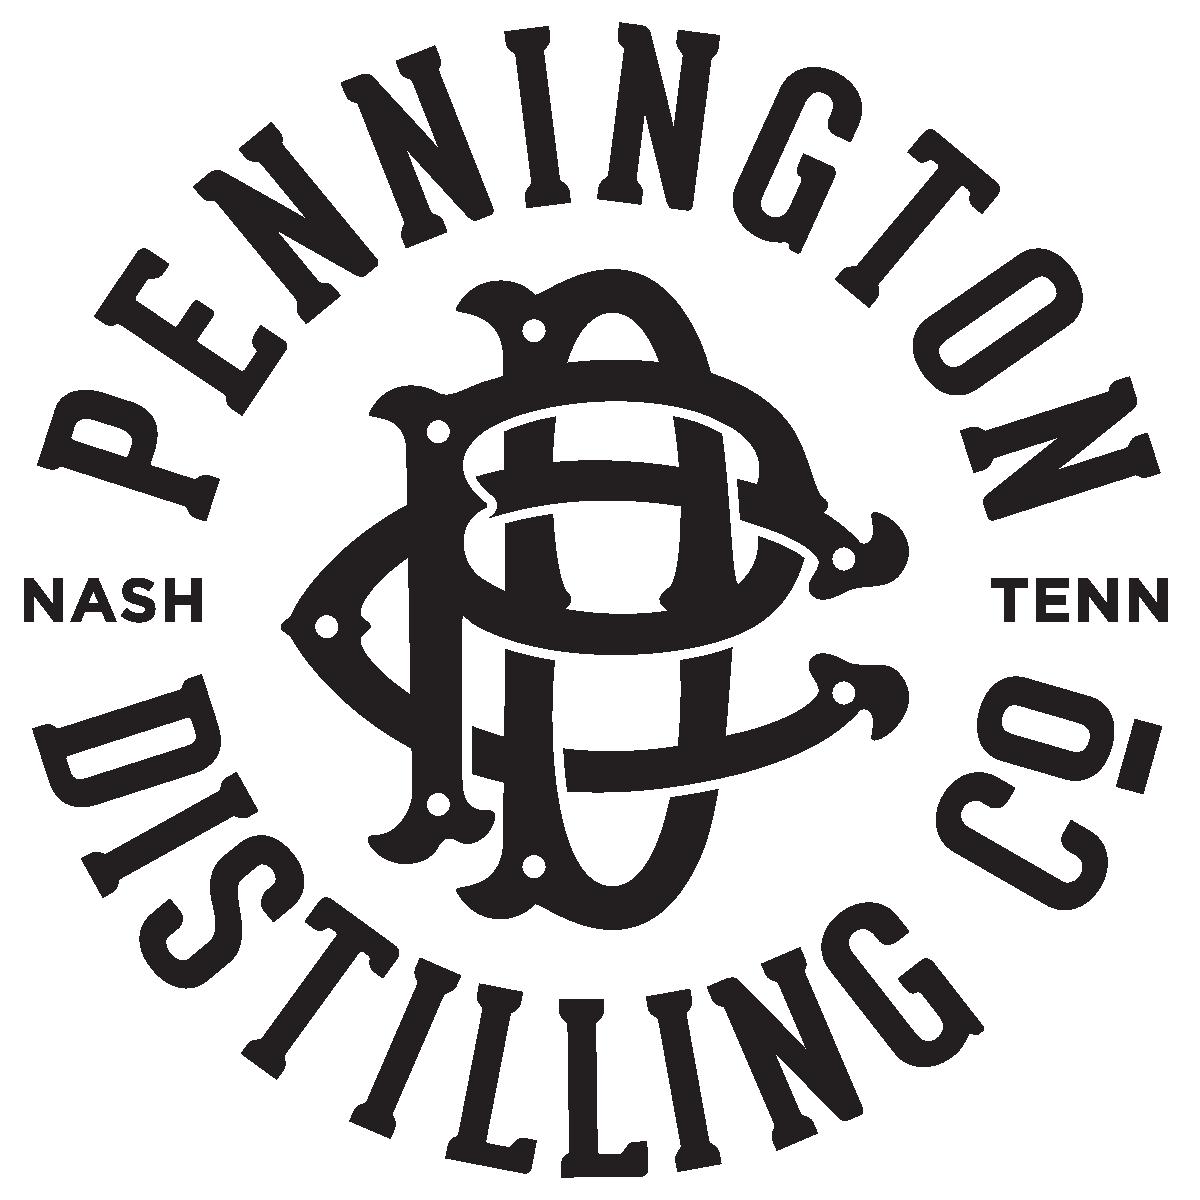 Pennington Distilling Co